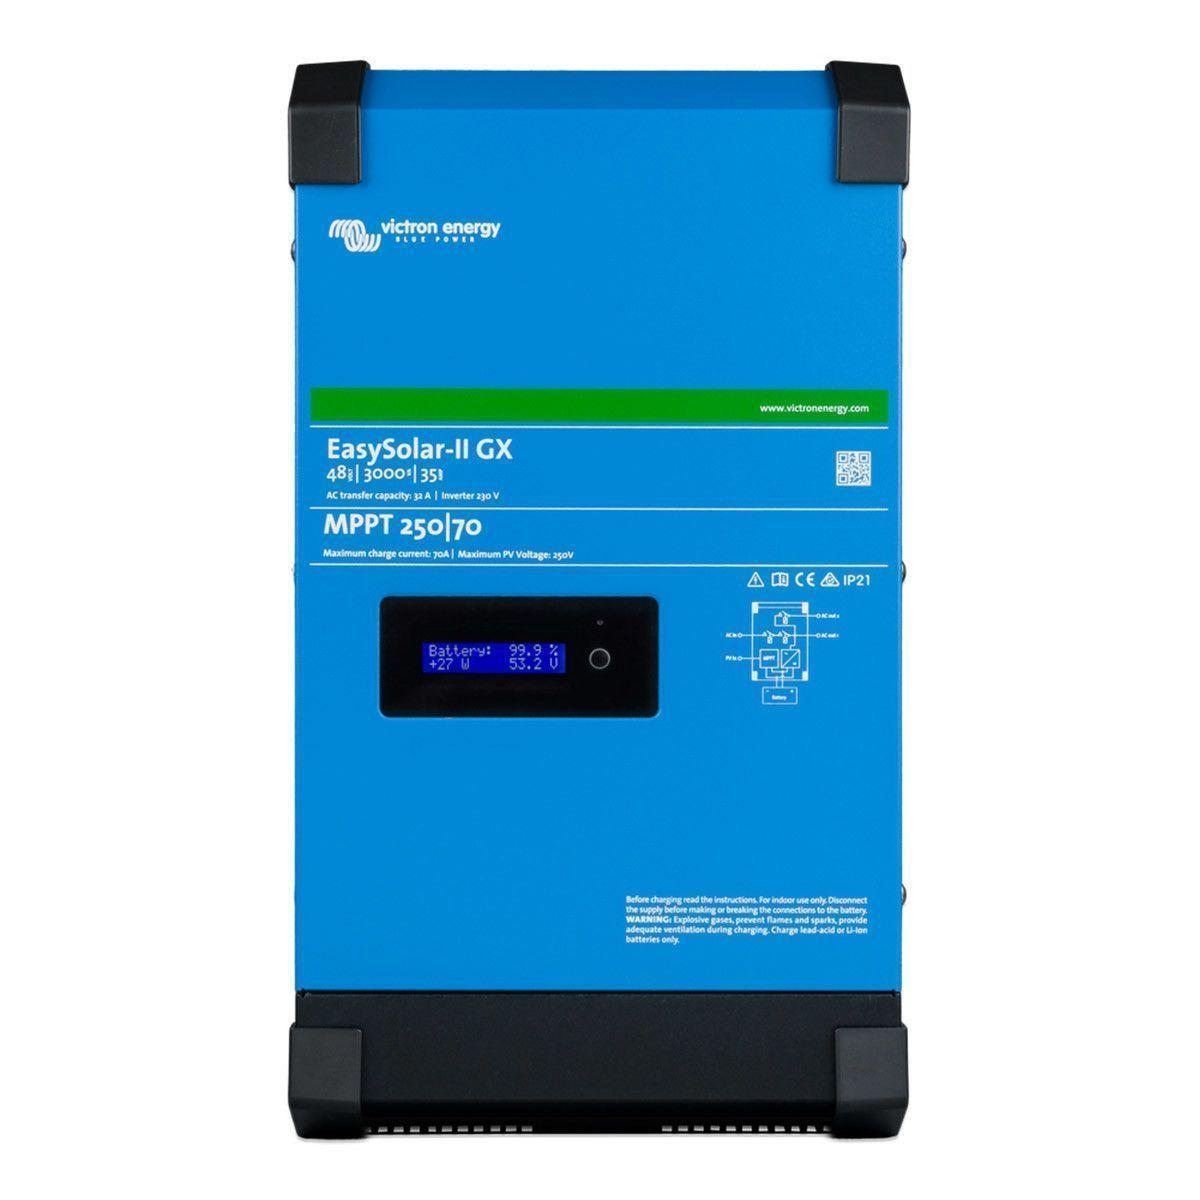 EasySolar-II 48 3000 35-32 MPPT 250 70 GX Victron Energy